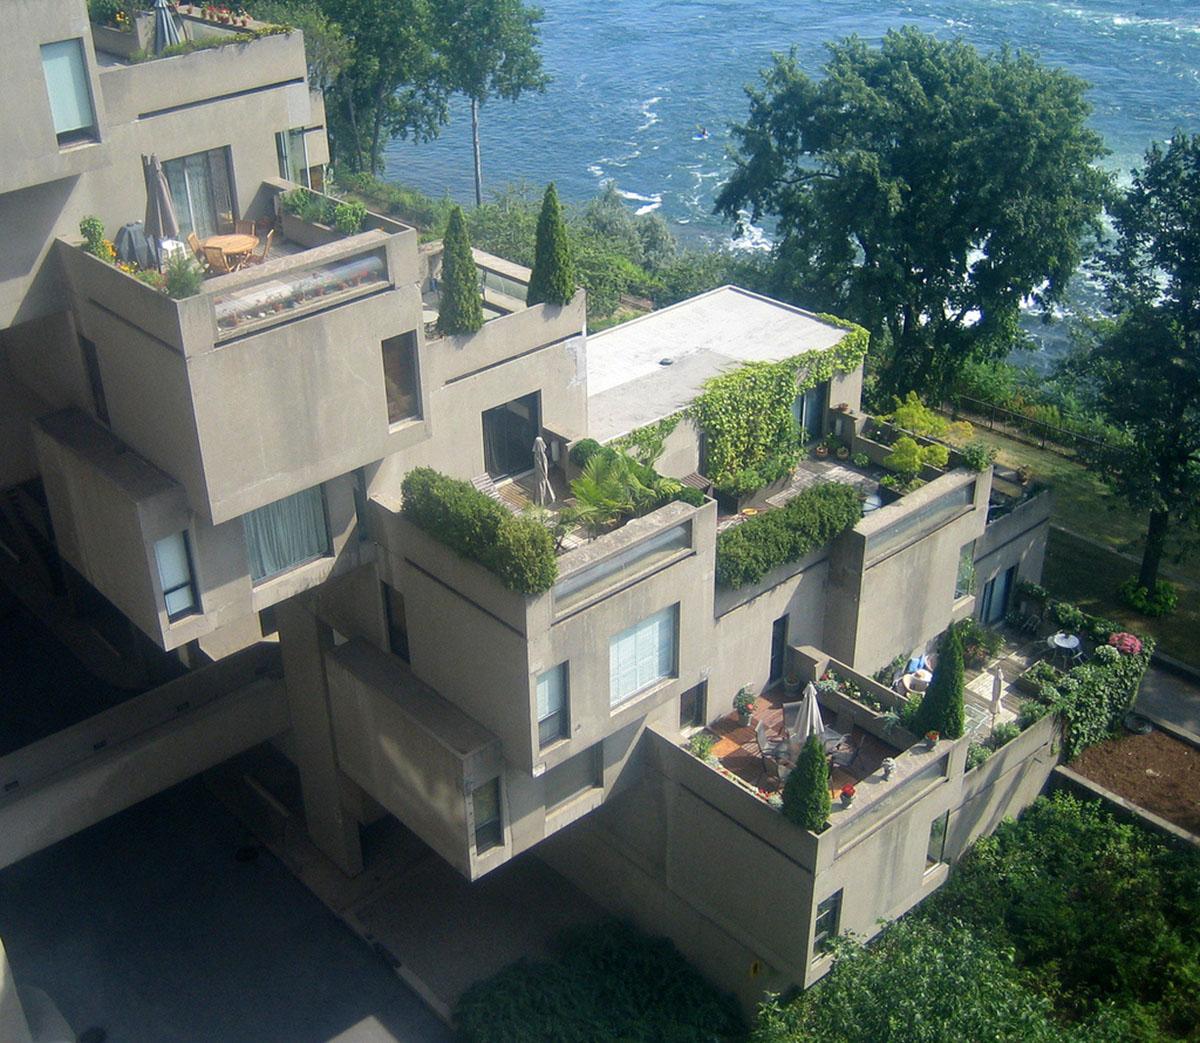 Habitat 67 - Brutalist Architecture in Montreal by Moshe Safdie - 04